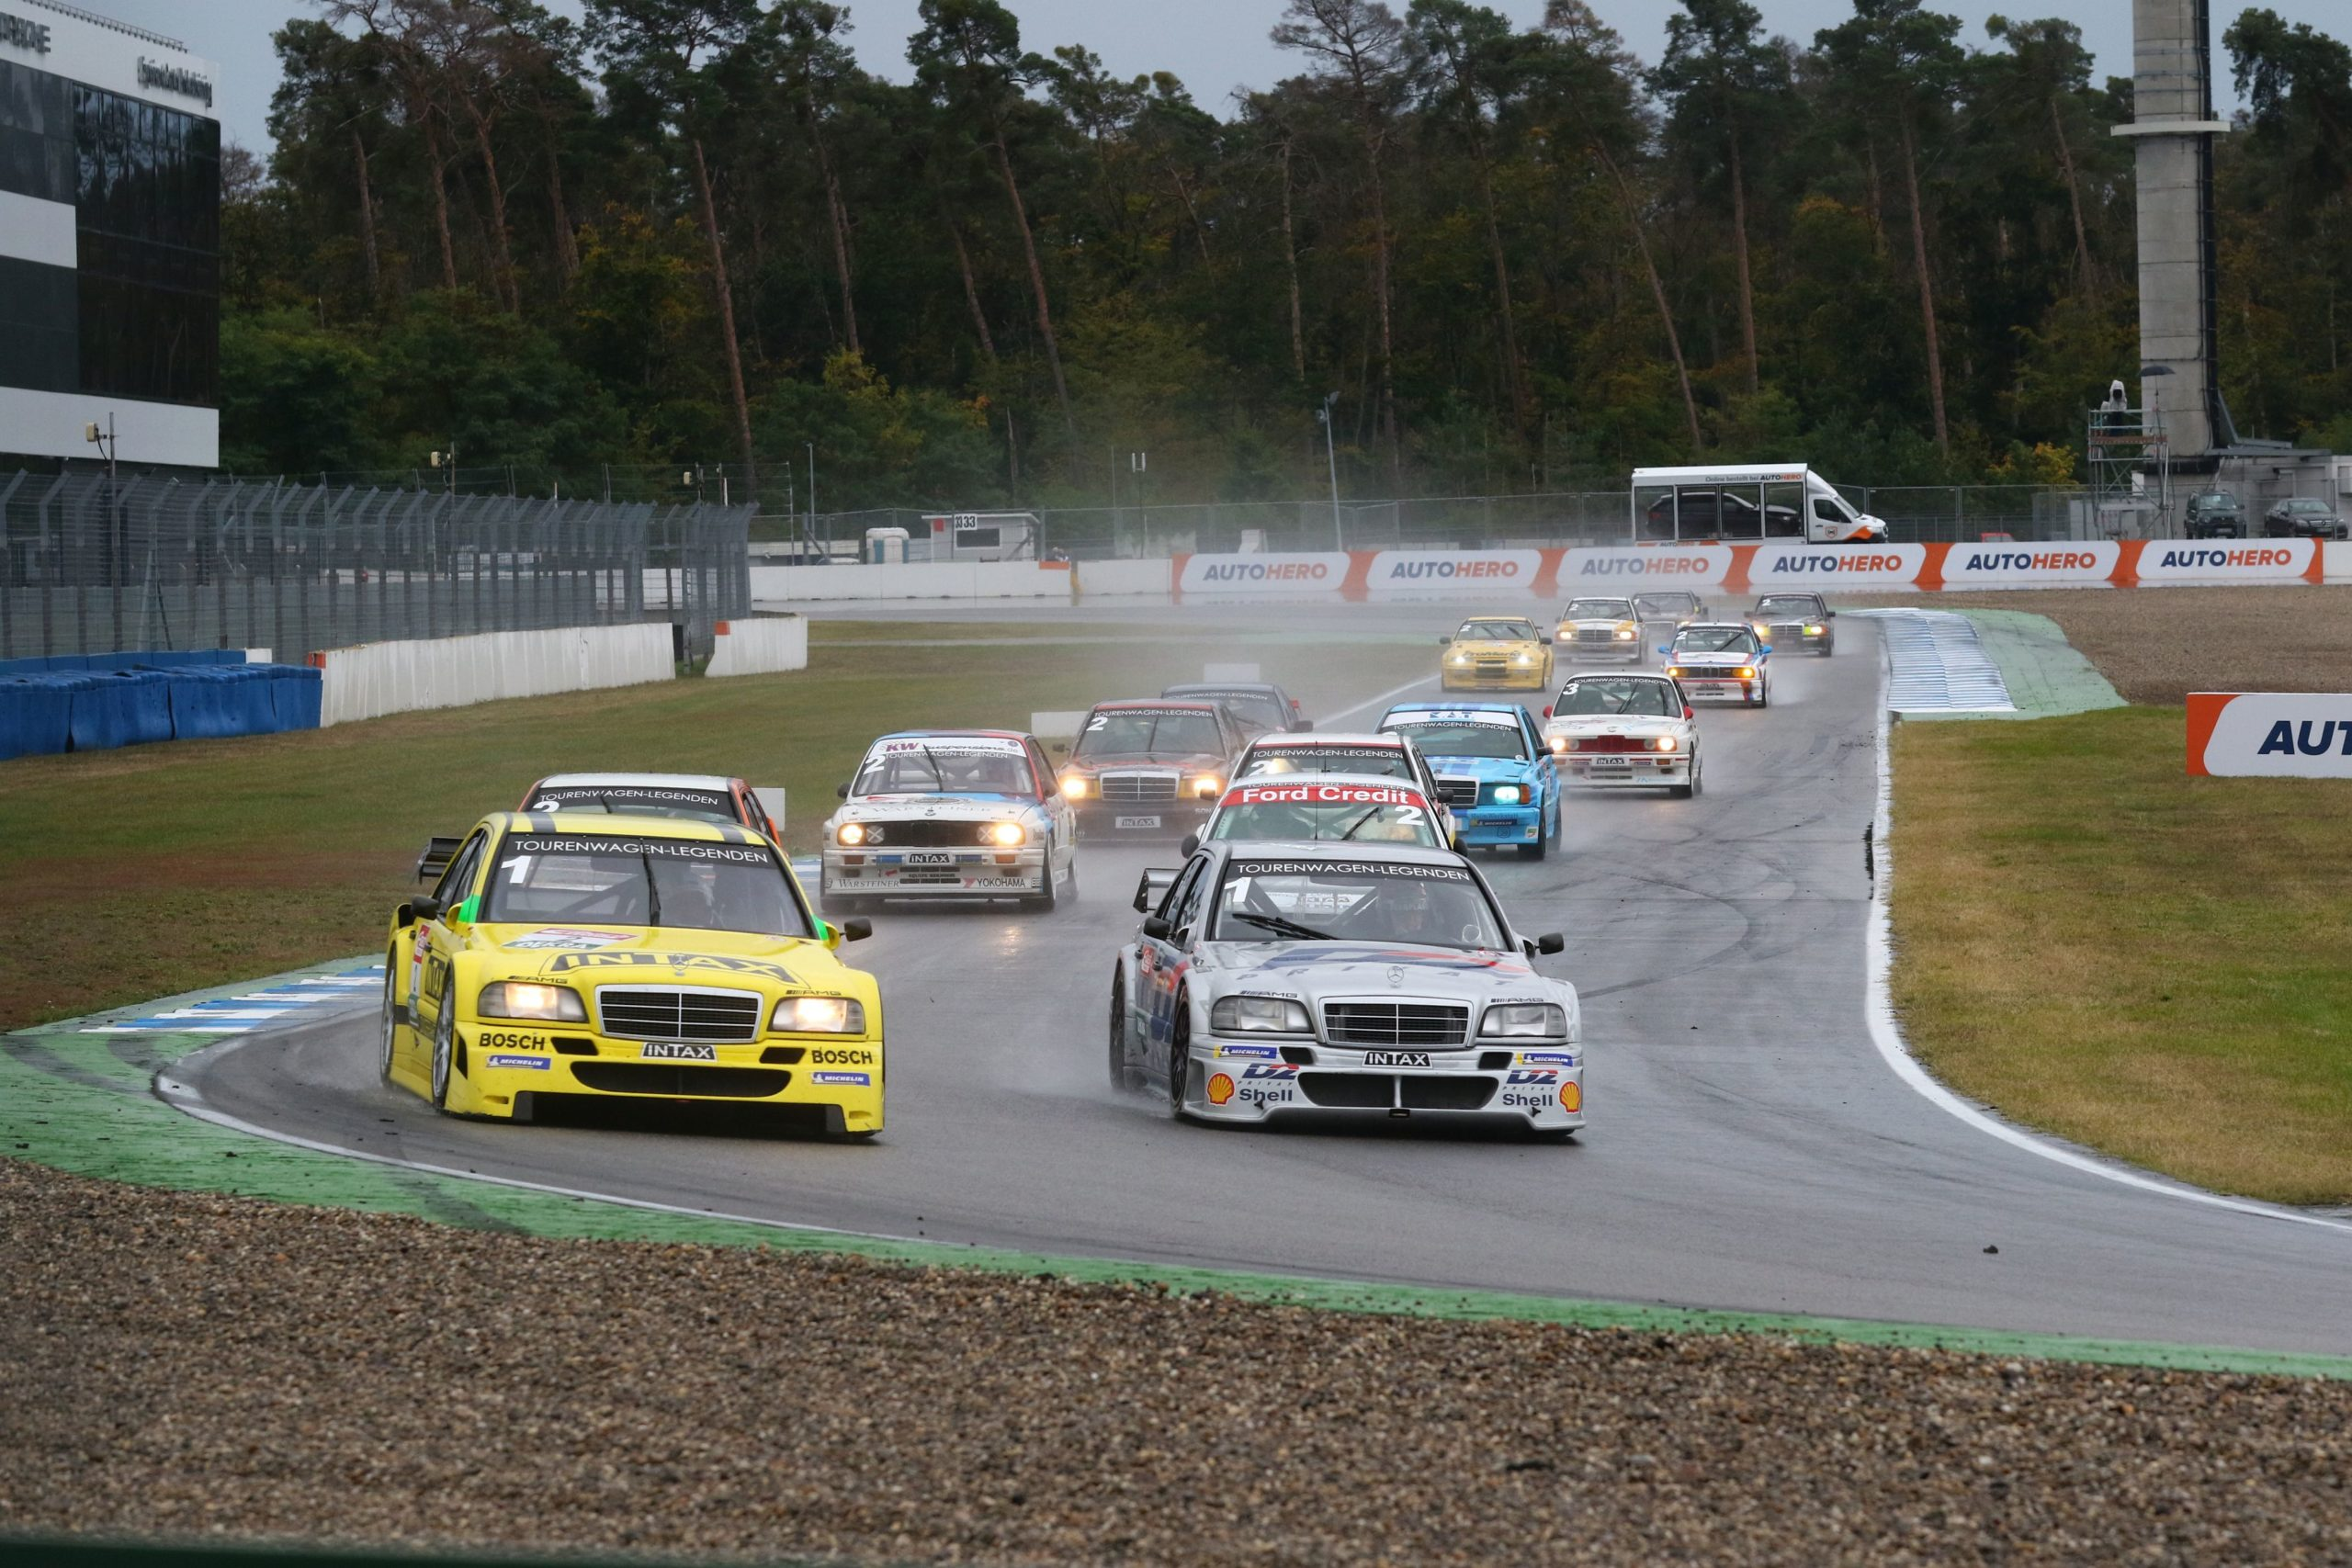 DTM-Classic-tst-sport-und-technik-Mercedes-Benz-Guido-Momm-2129733